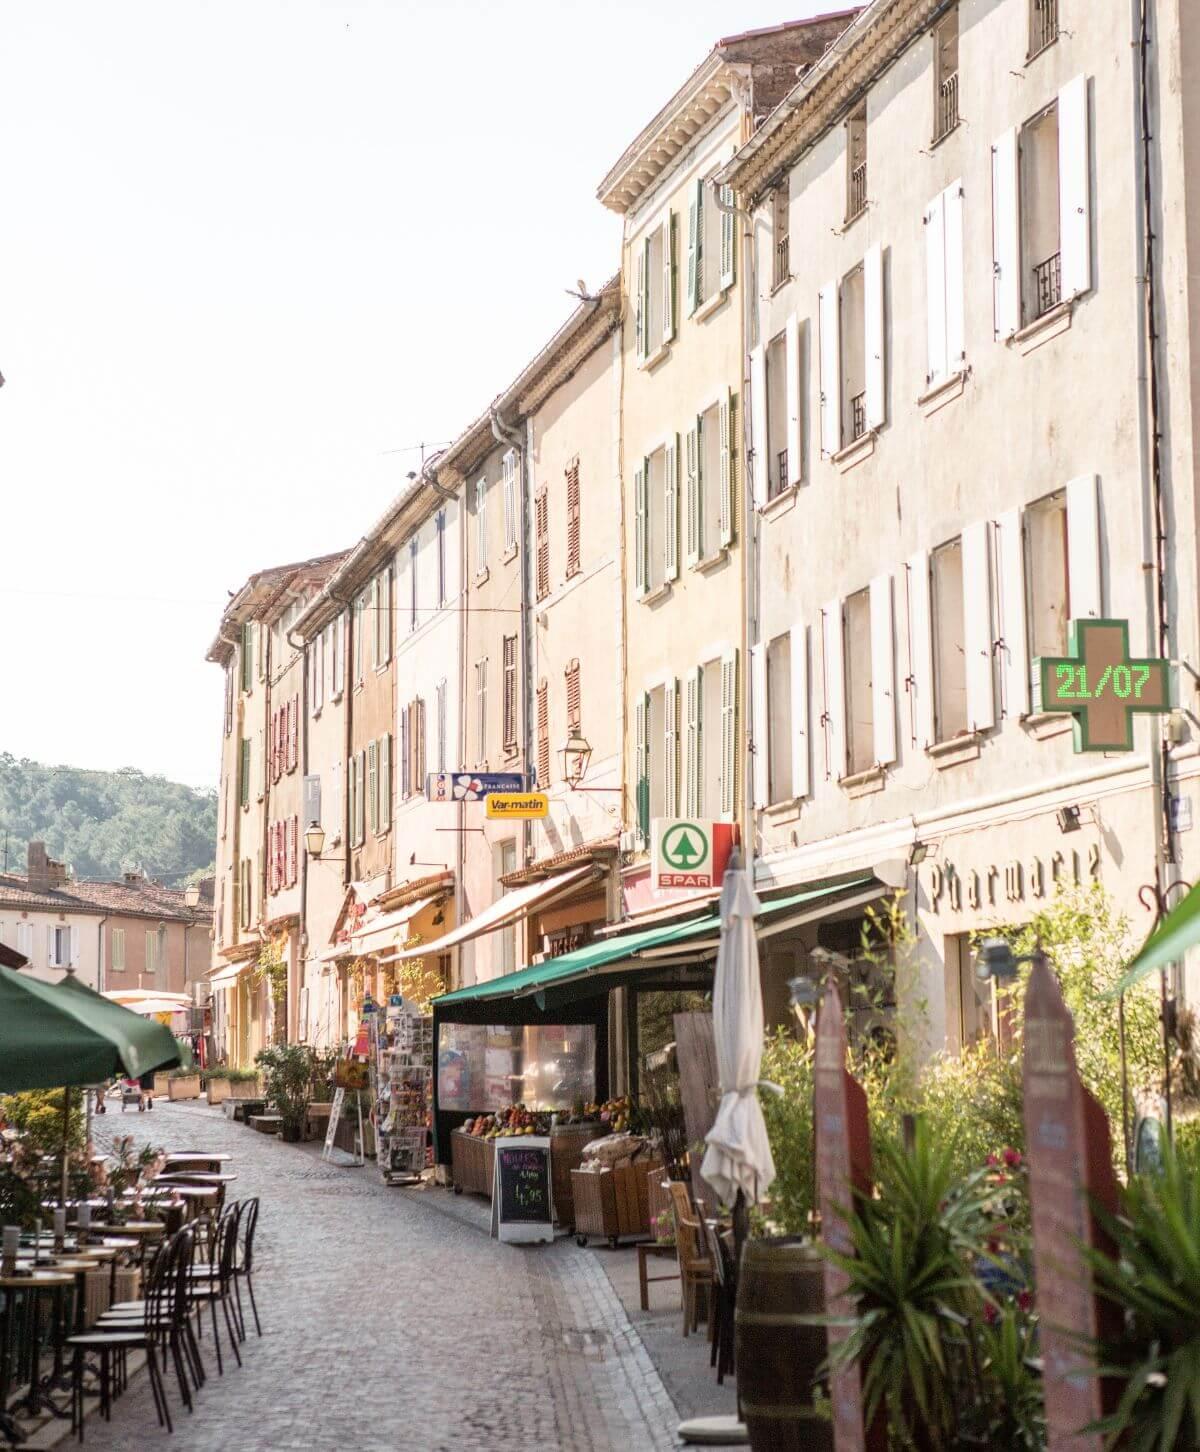 20._Local_Area_Shops__Restaurants